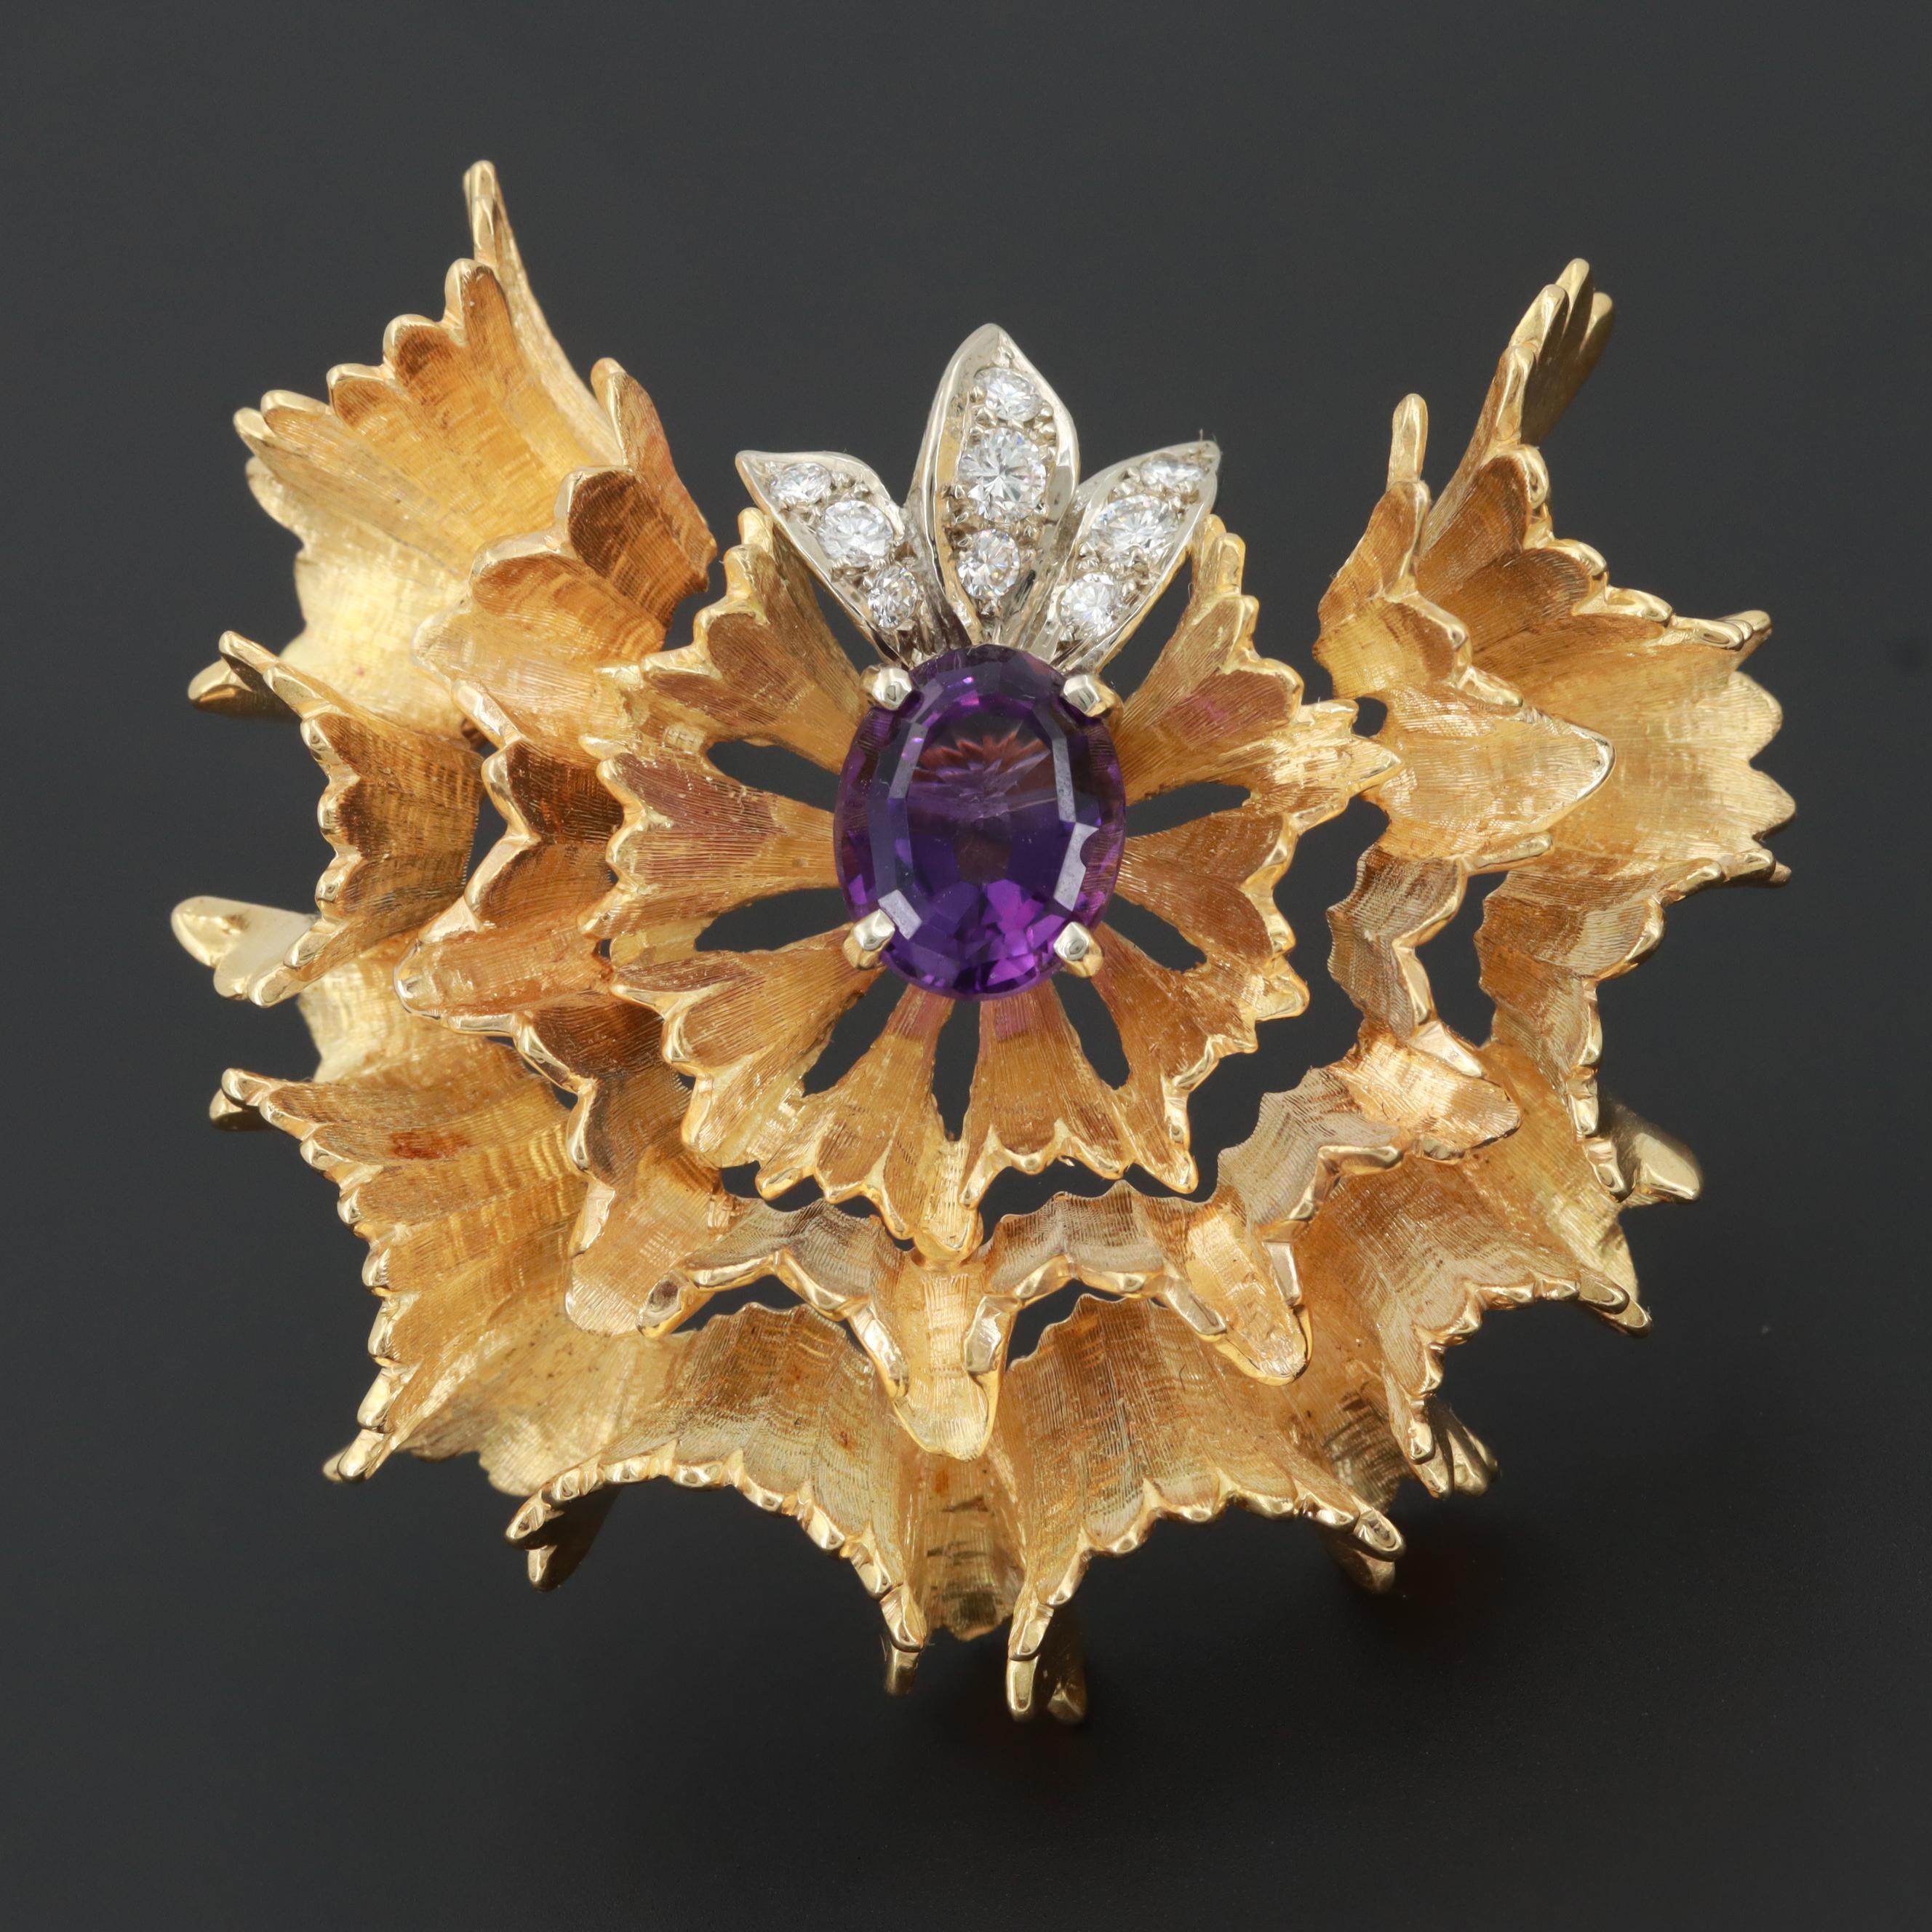 Circa 1950s 18K Yellow Gold Amethyst and Diamond Brooch